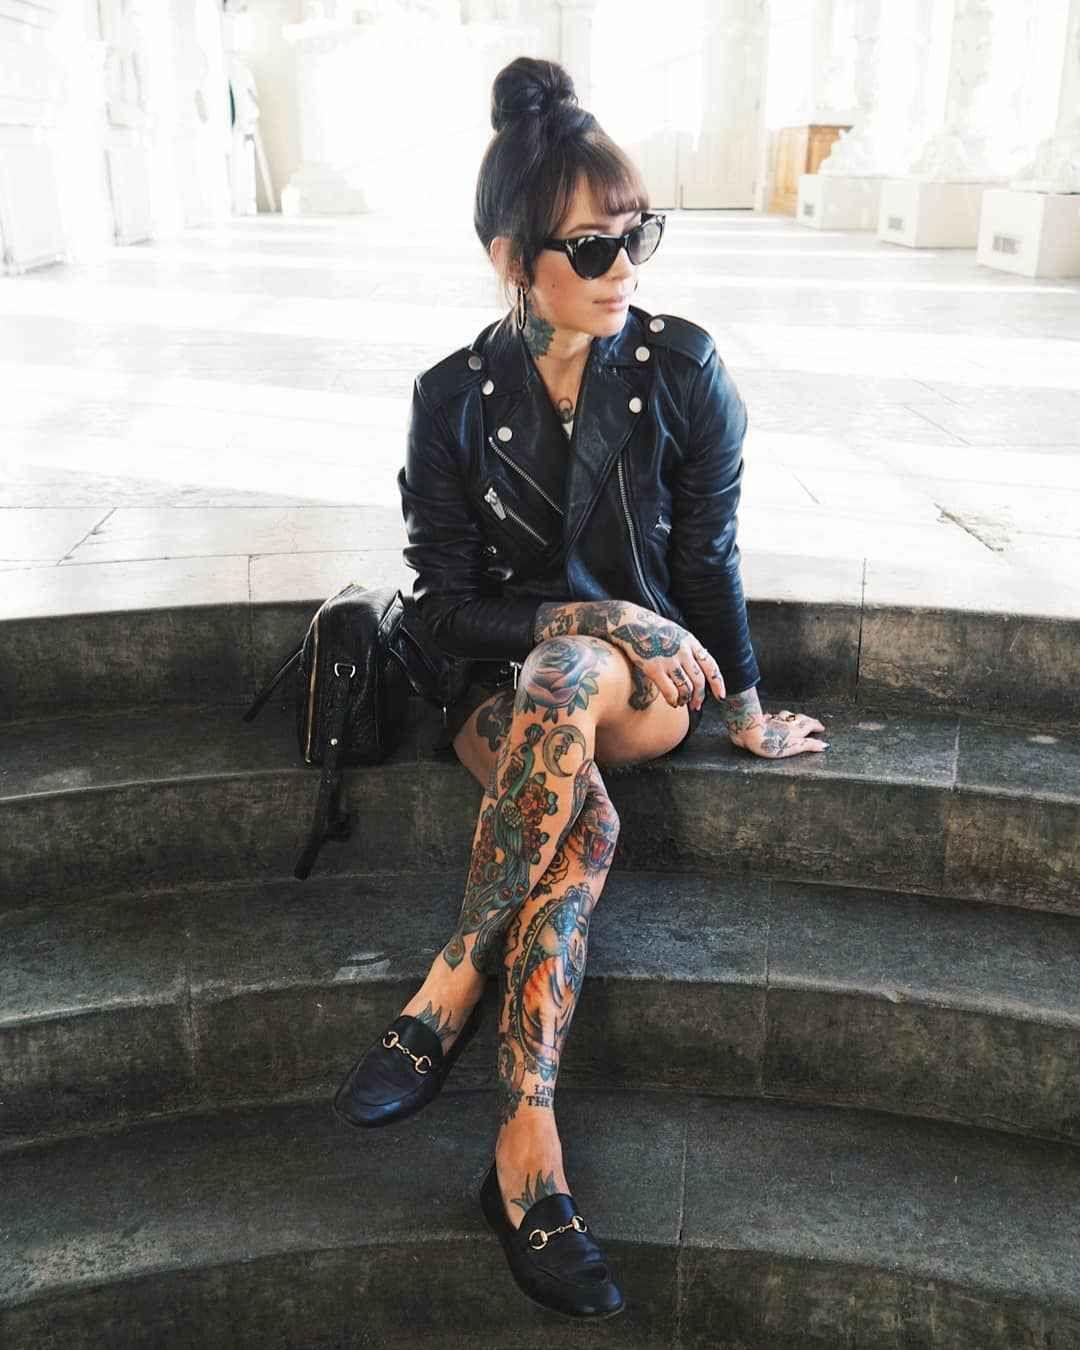 Tattooed model and fashion blogger Sammi Jefcoate